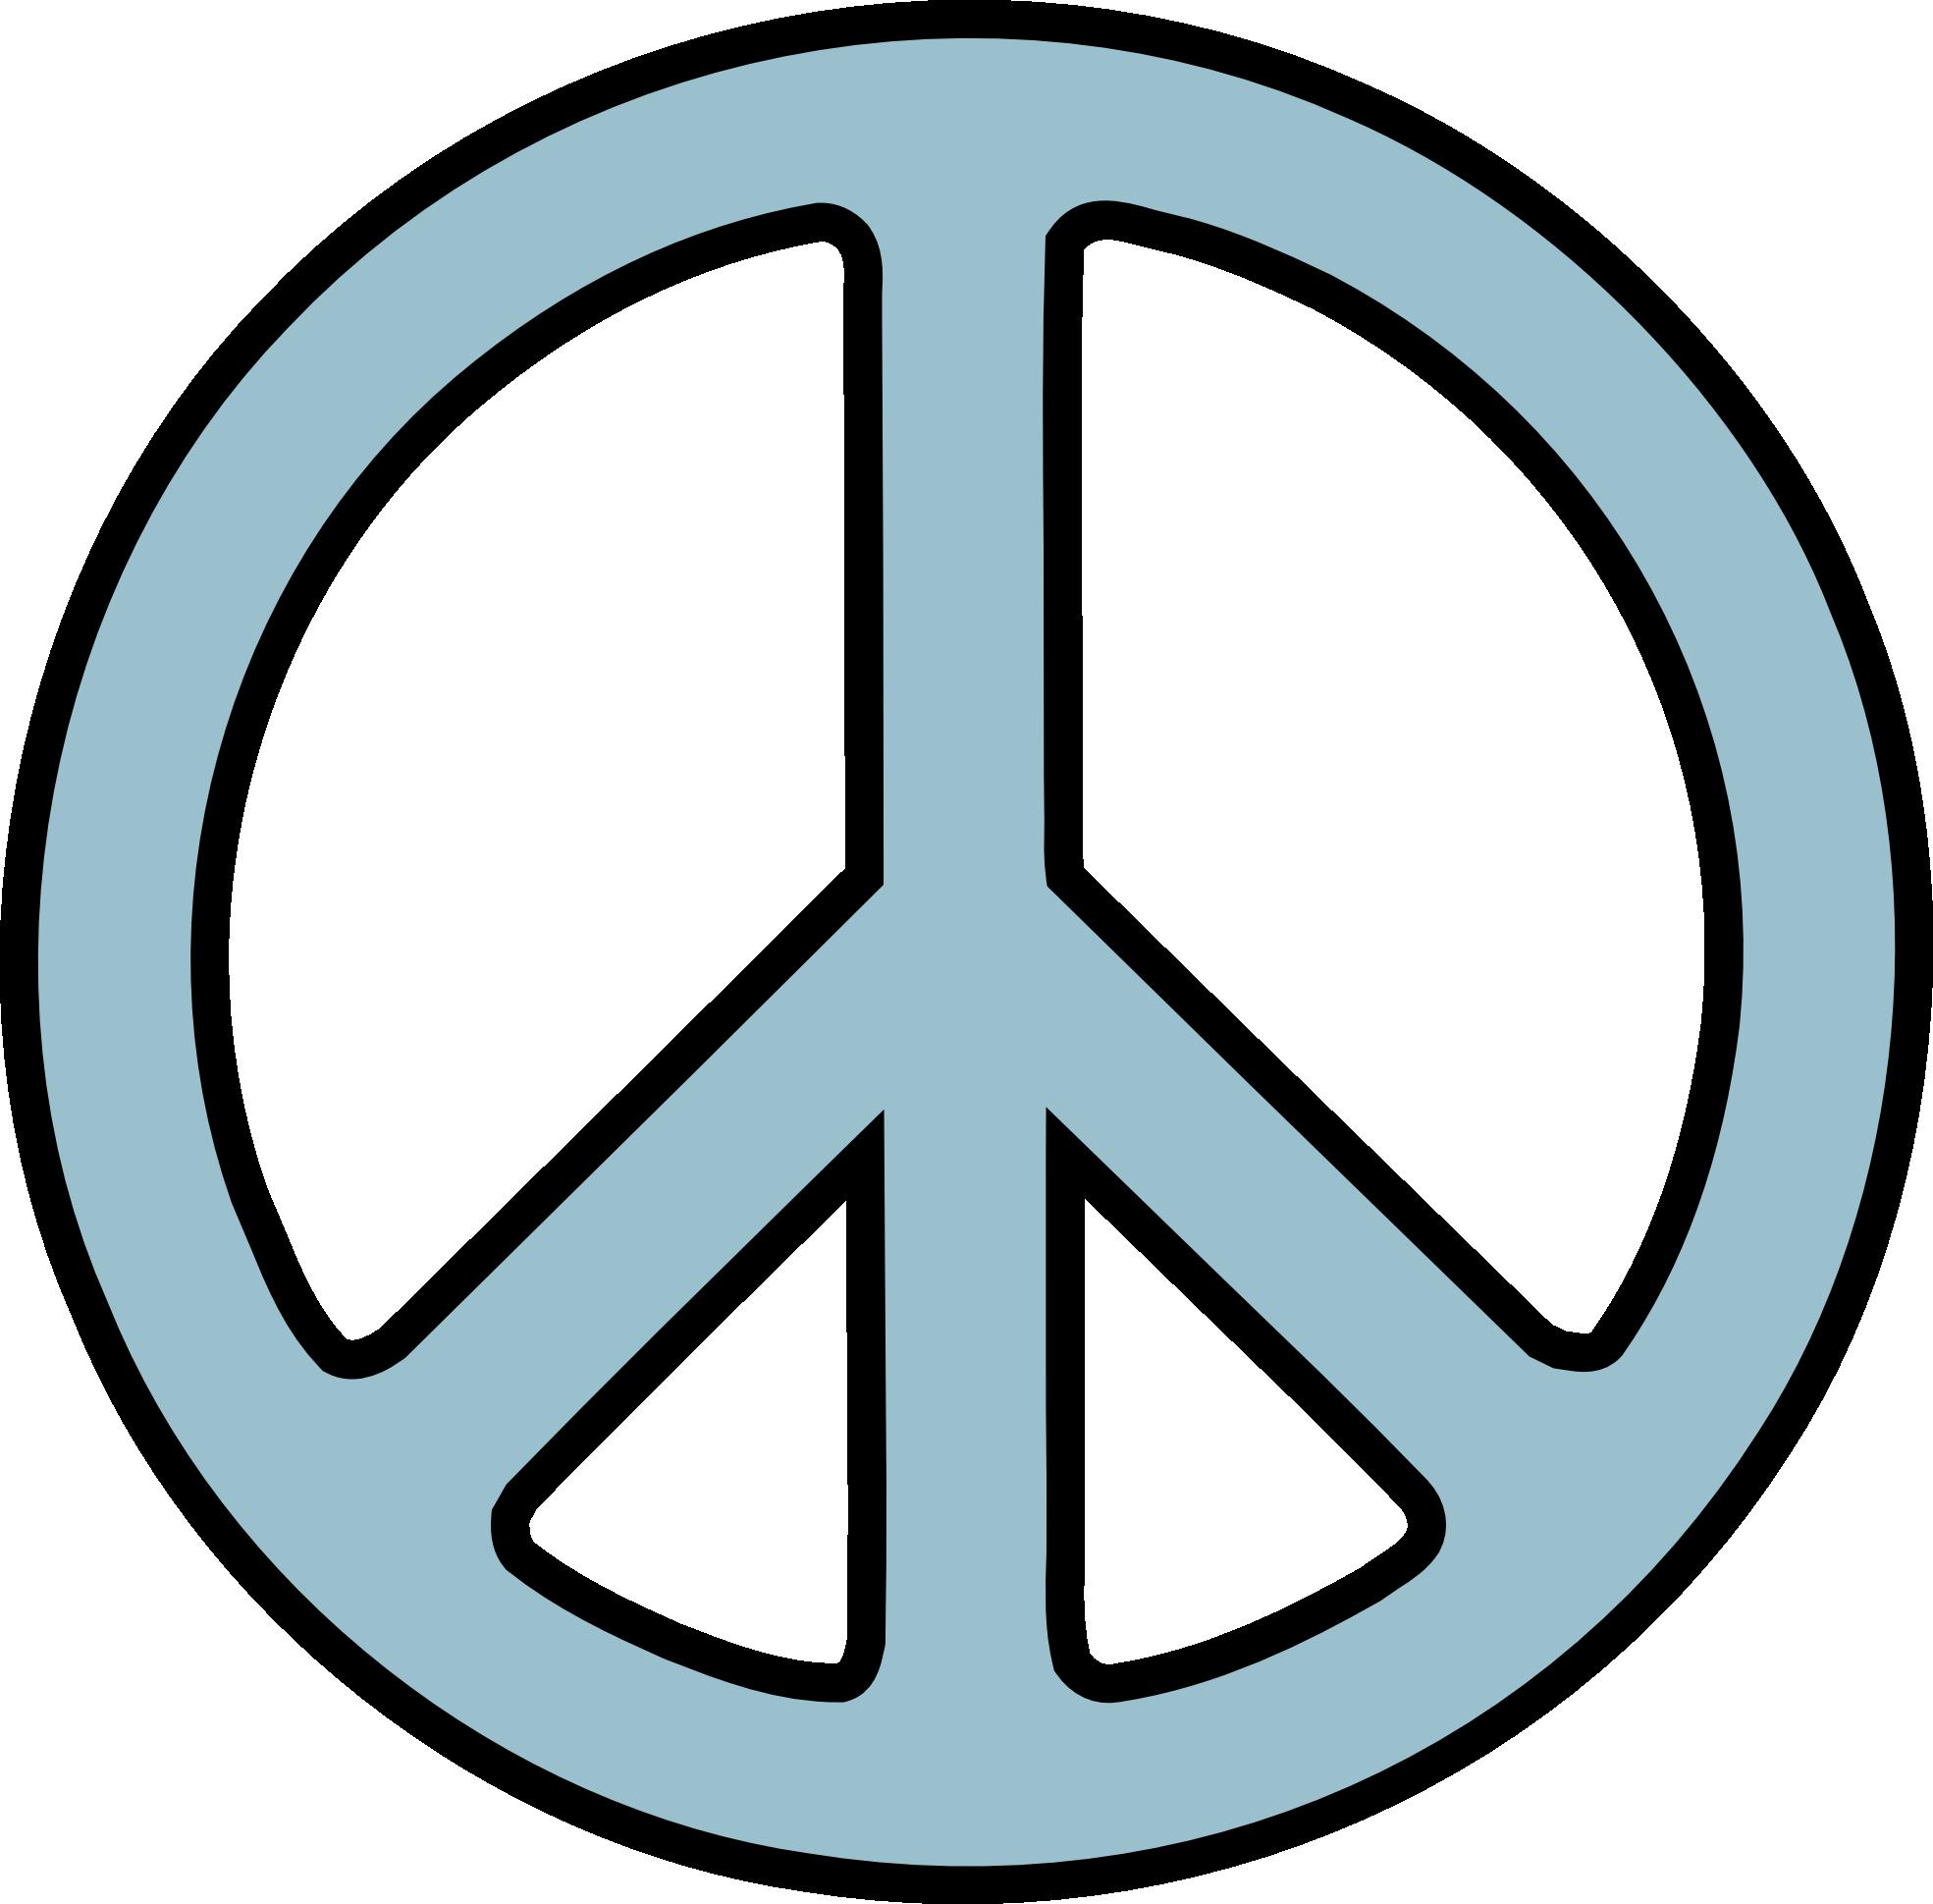 Peace clipart peace quiet. Signs clip art free